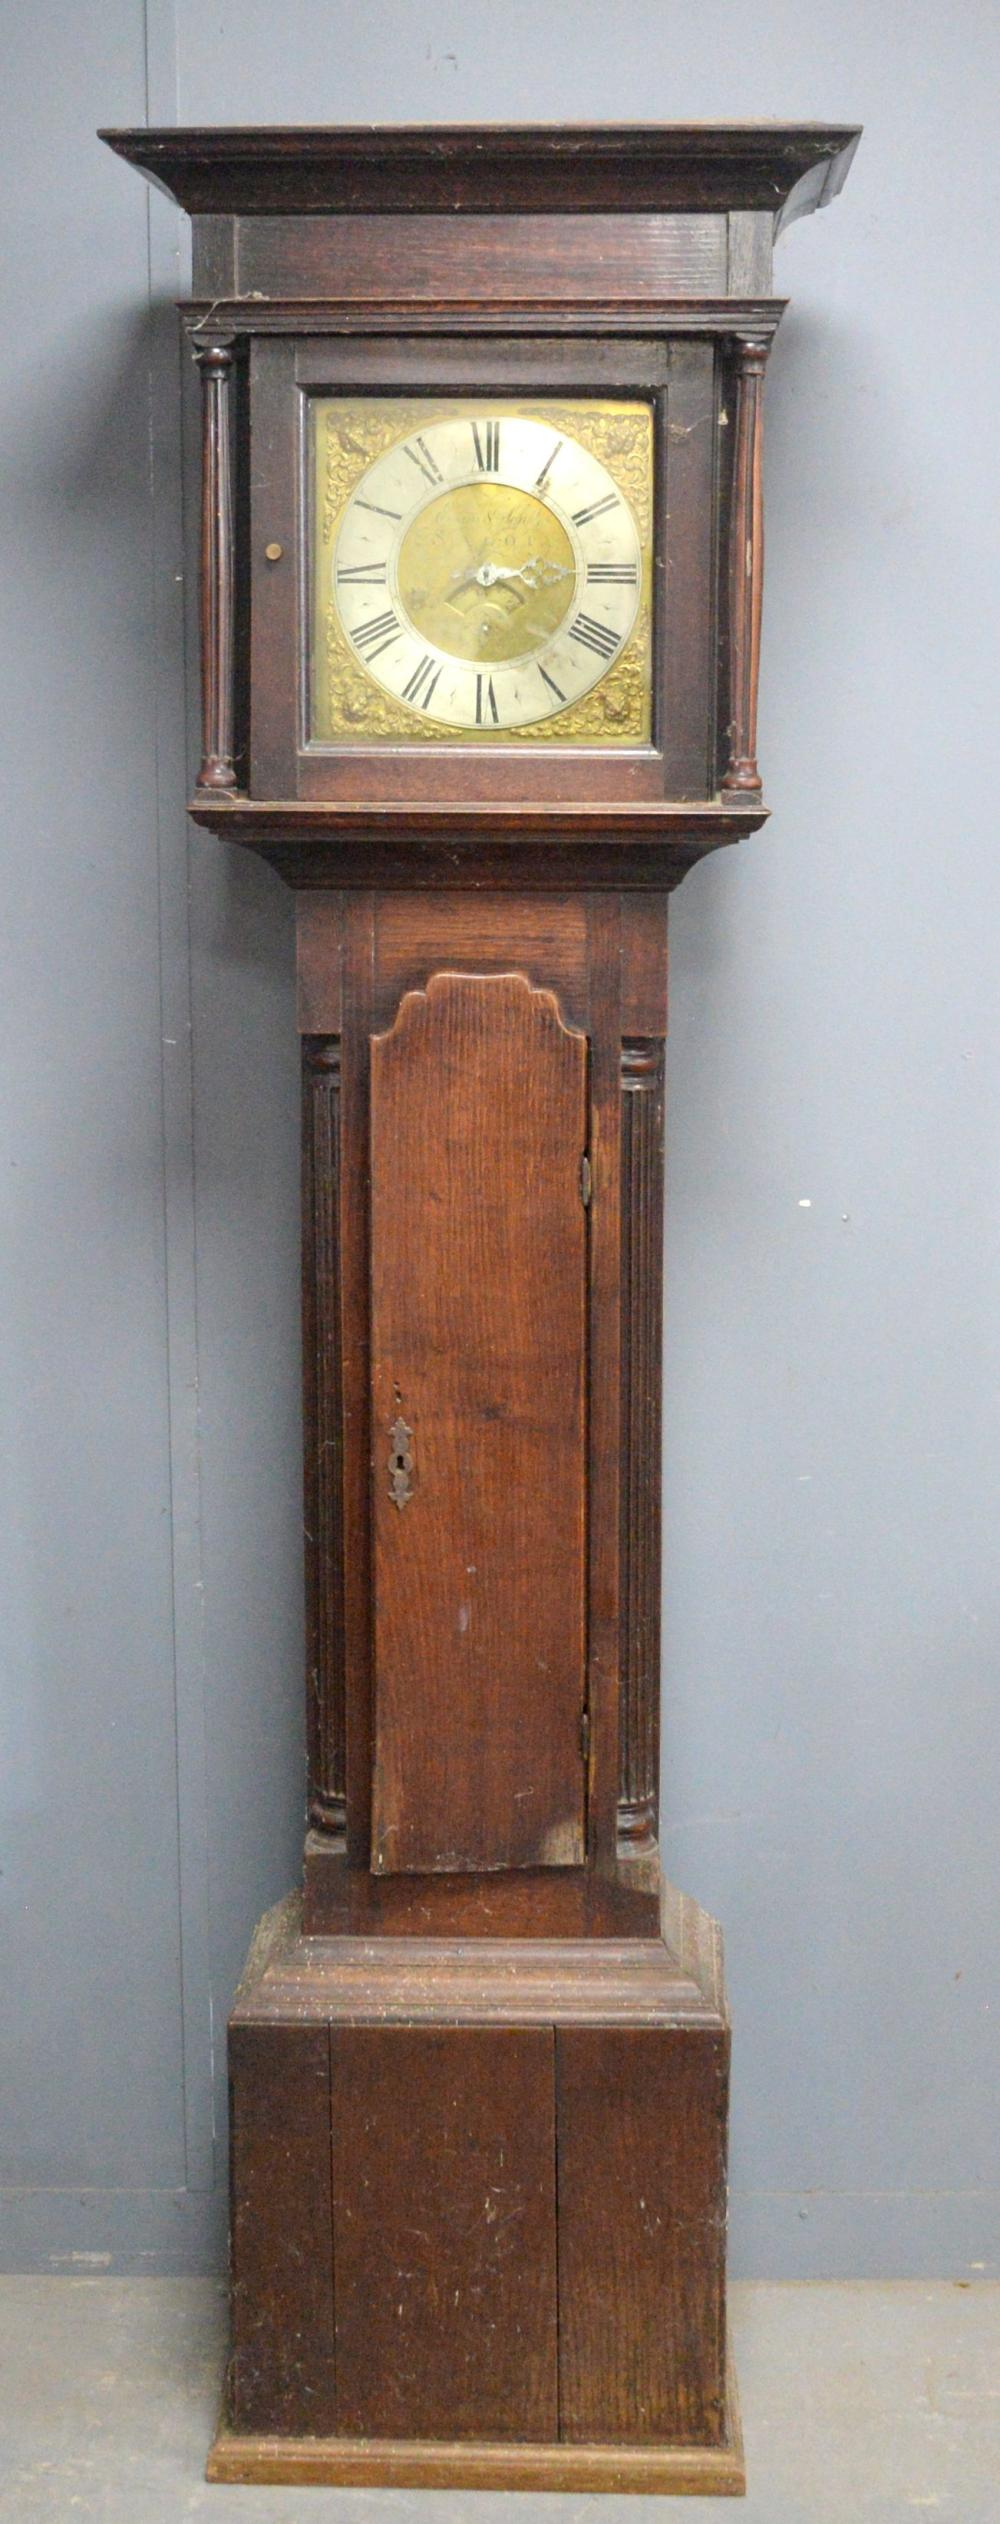 18th century oak cased 30 hour long case clock by